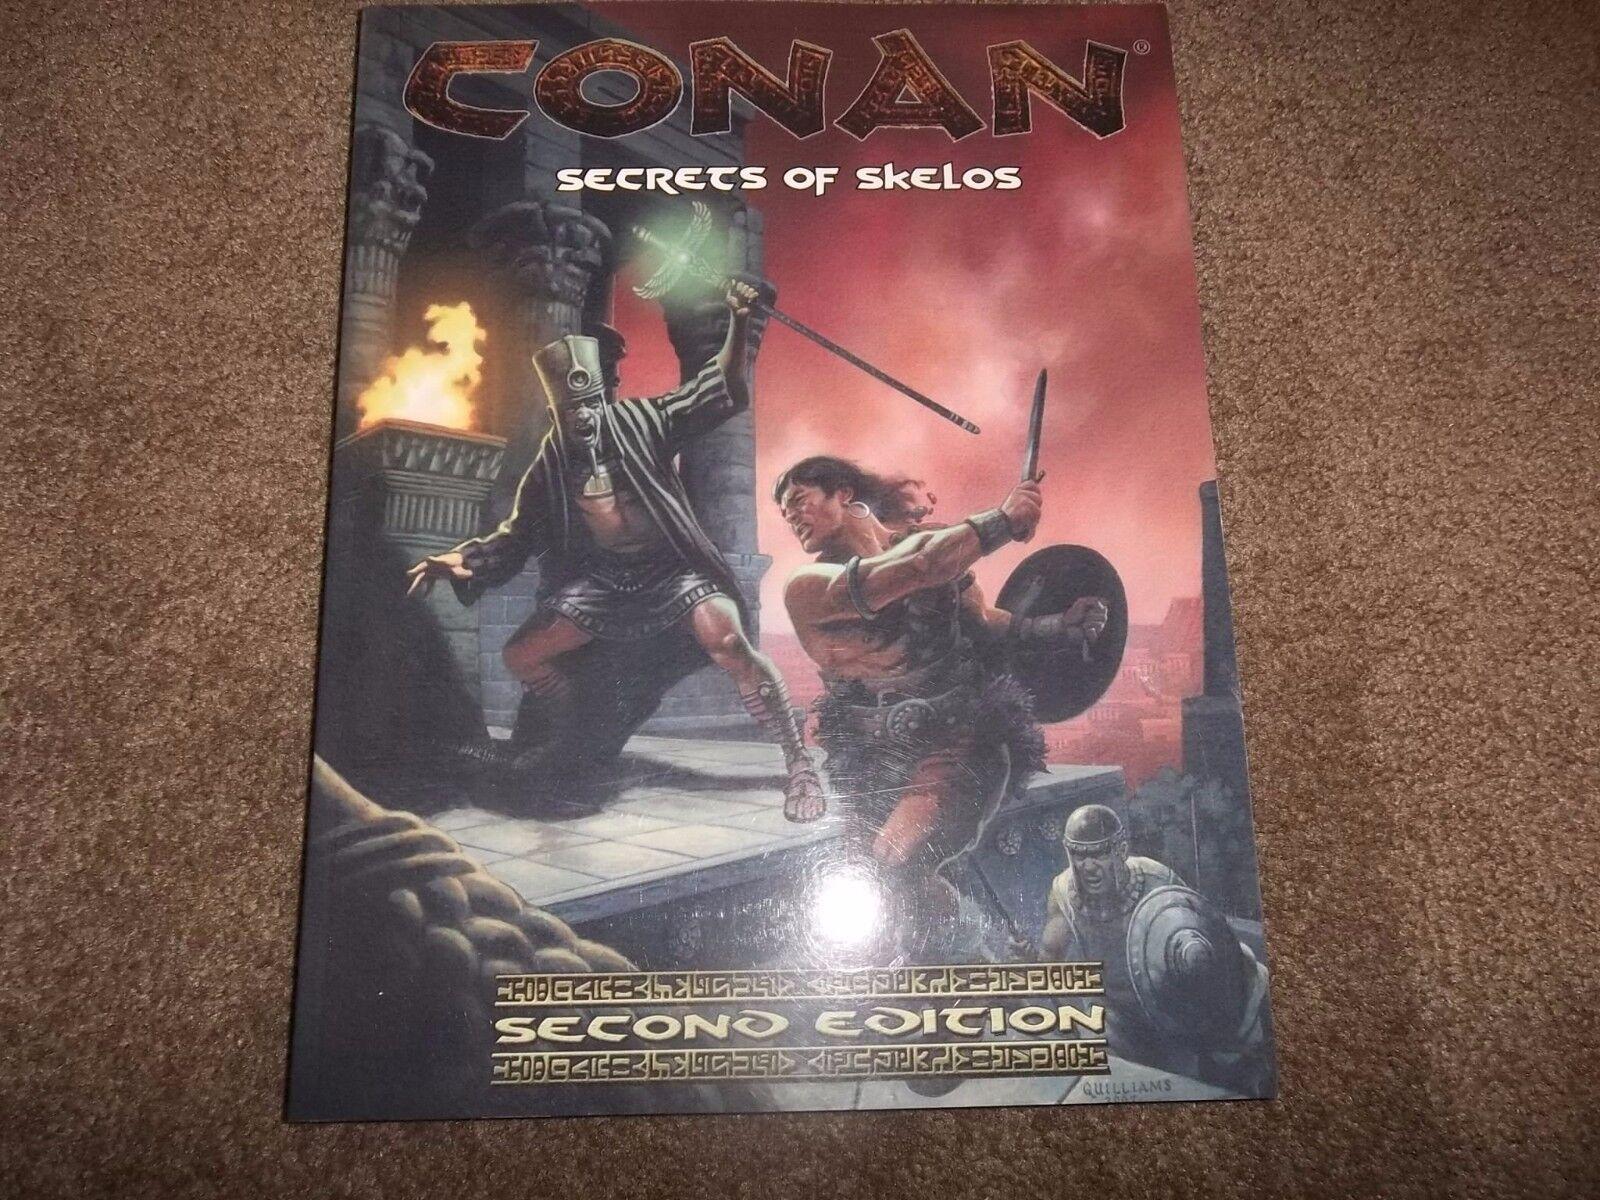 D&D D20 Mangosta Conan cohete propulsado Granada 2nd Ed secretos de Skelos